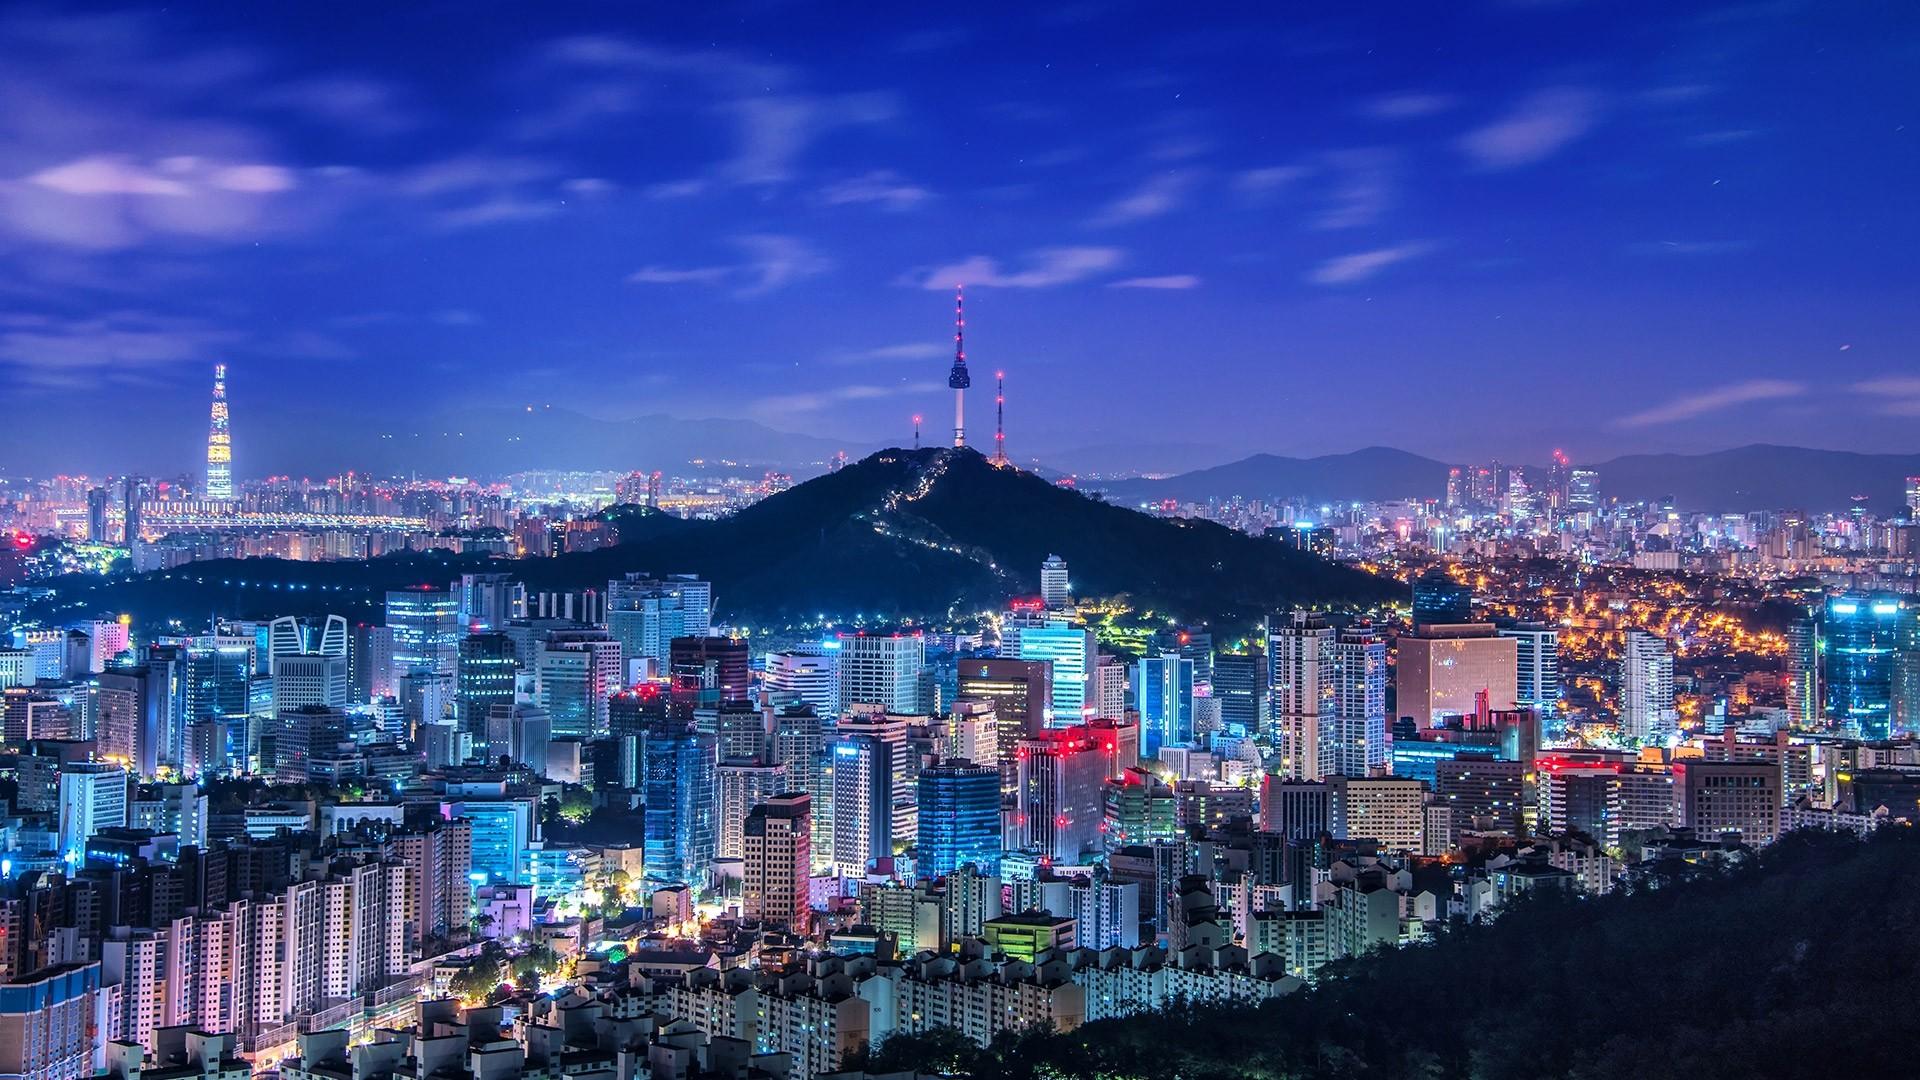 Seoul Wallpaper Download